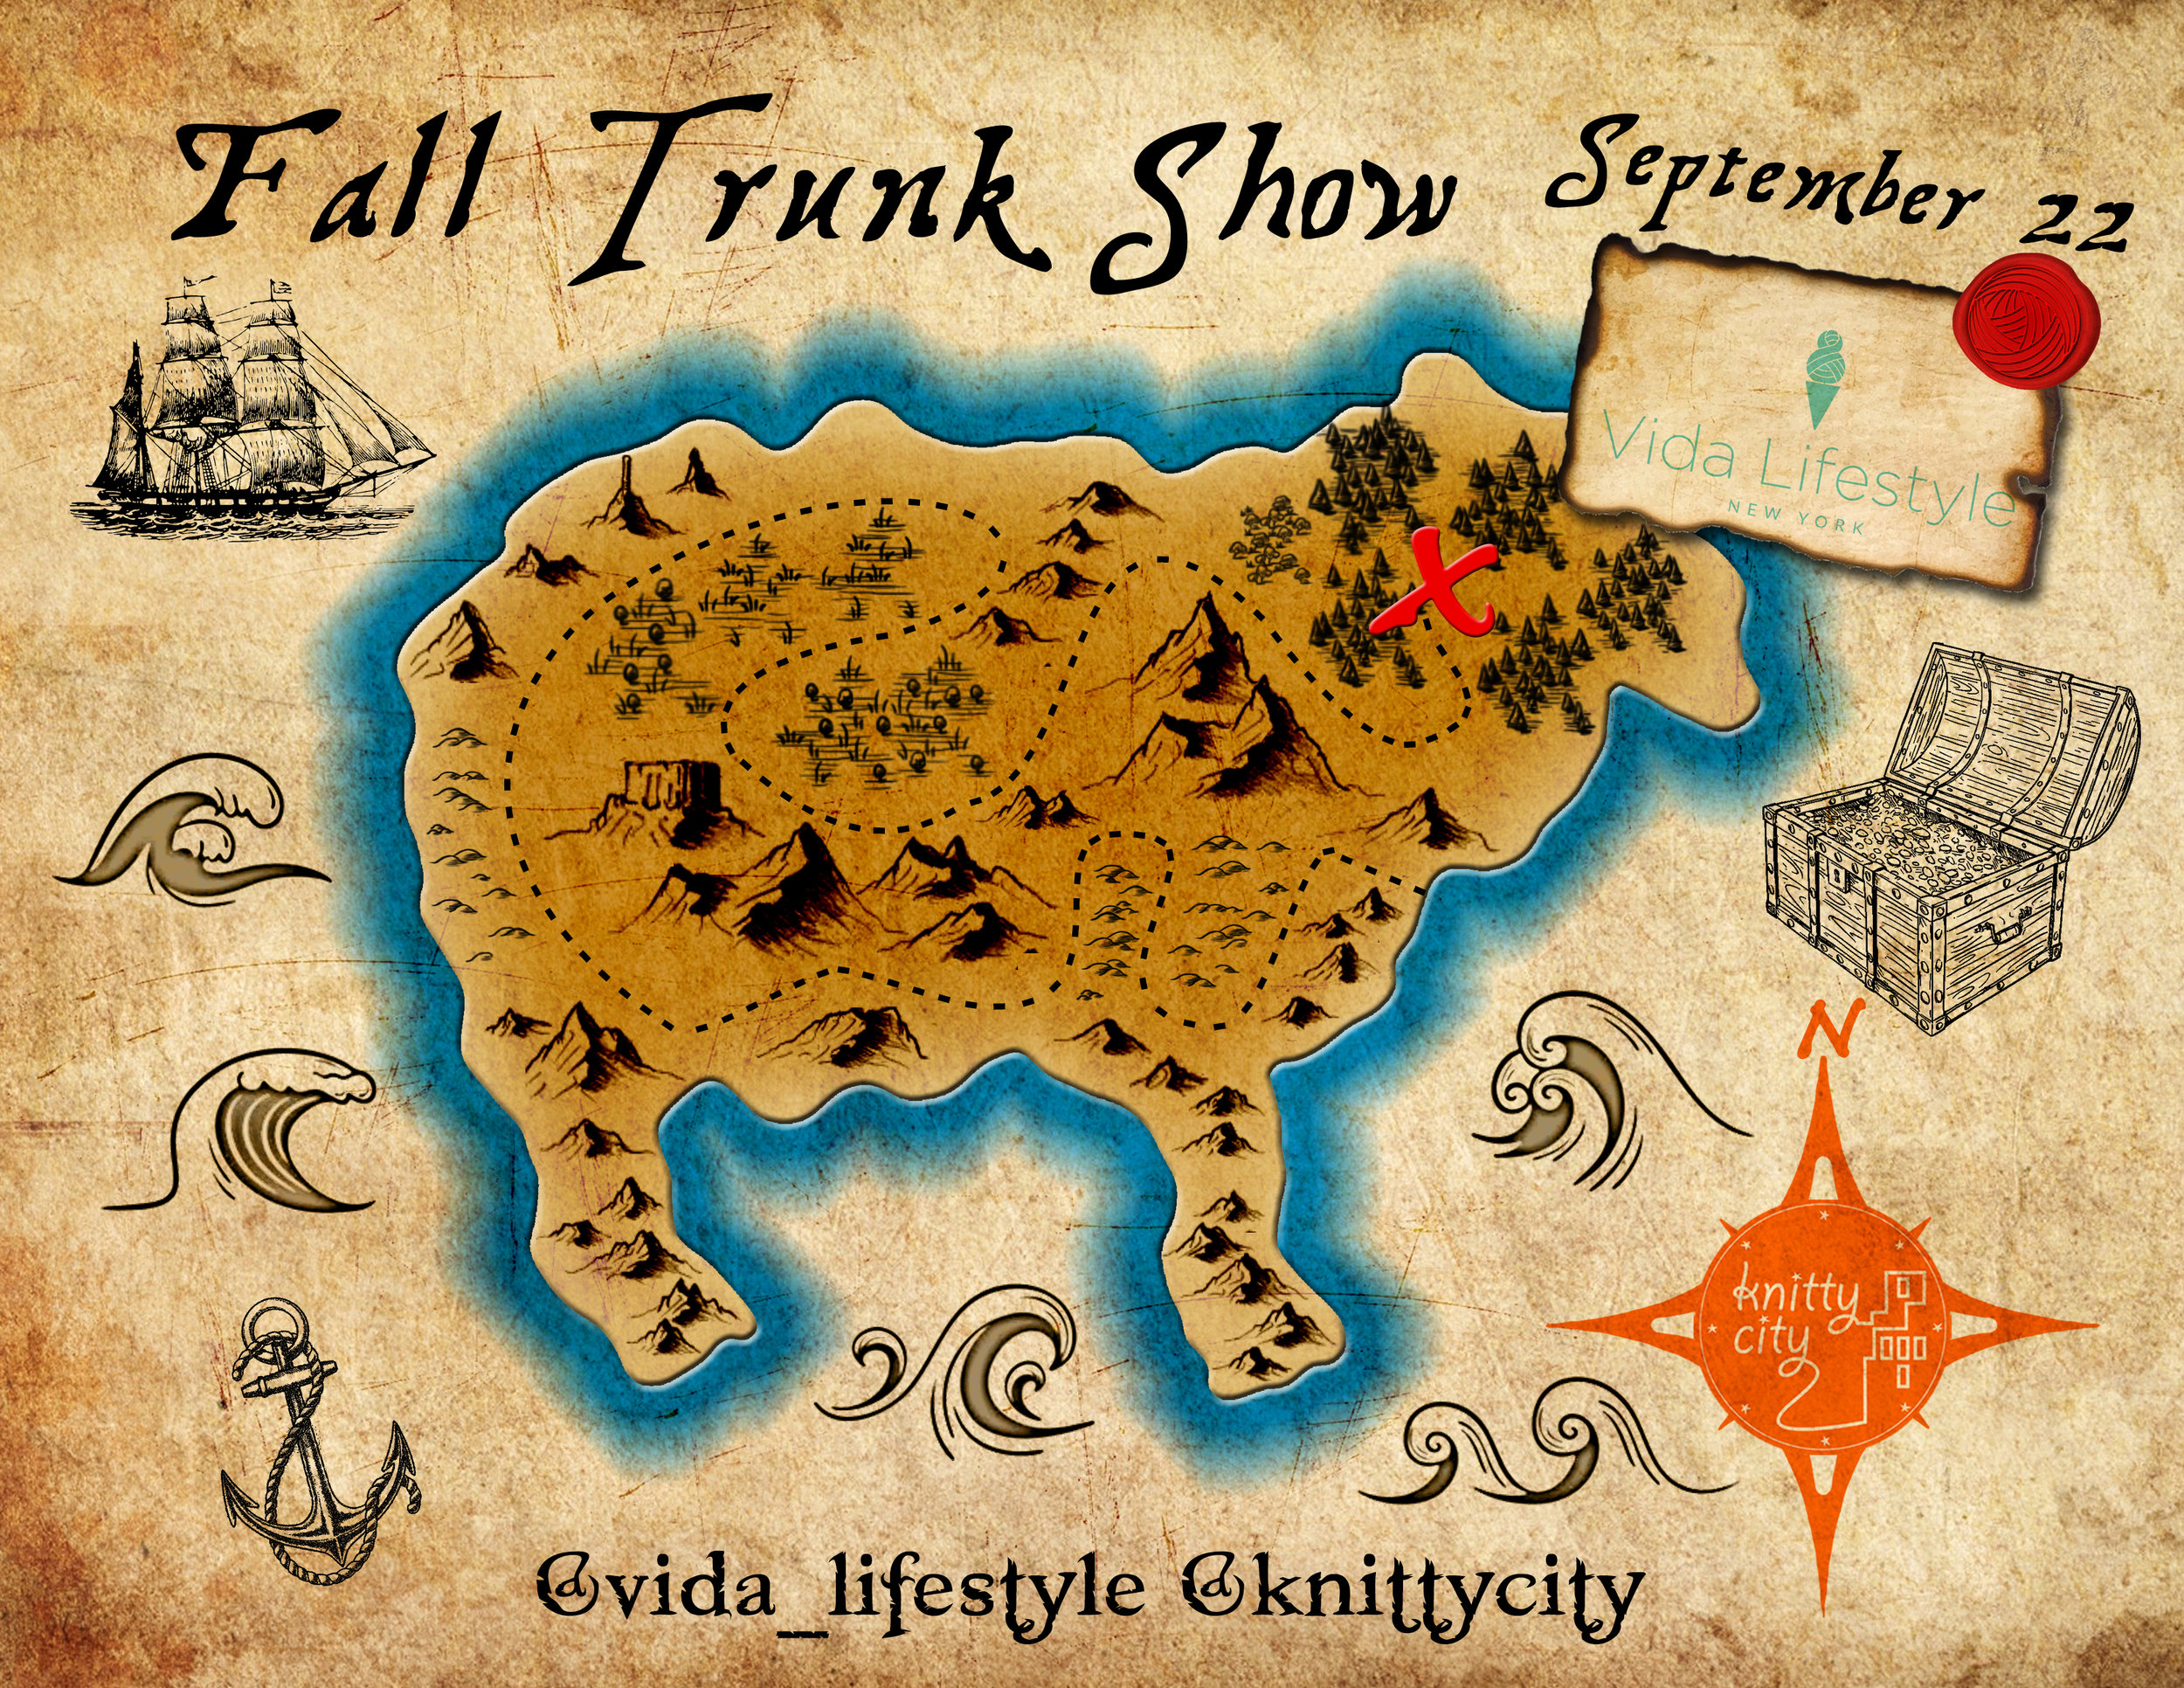 Treasure Map Vida Lifestyle.jpg